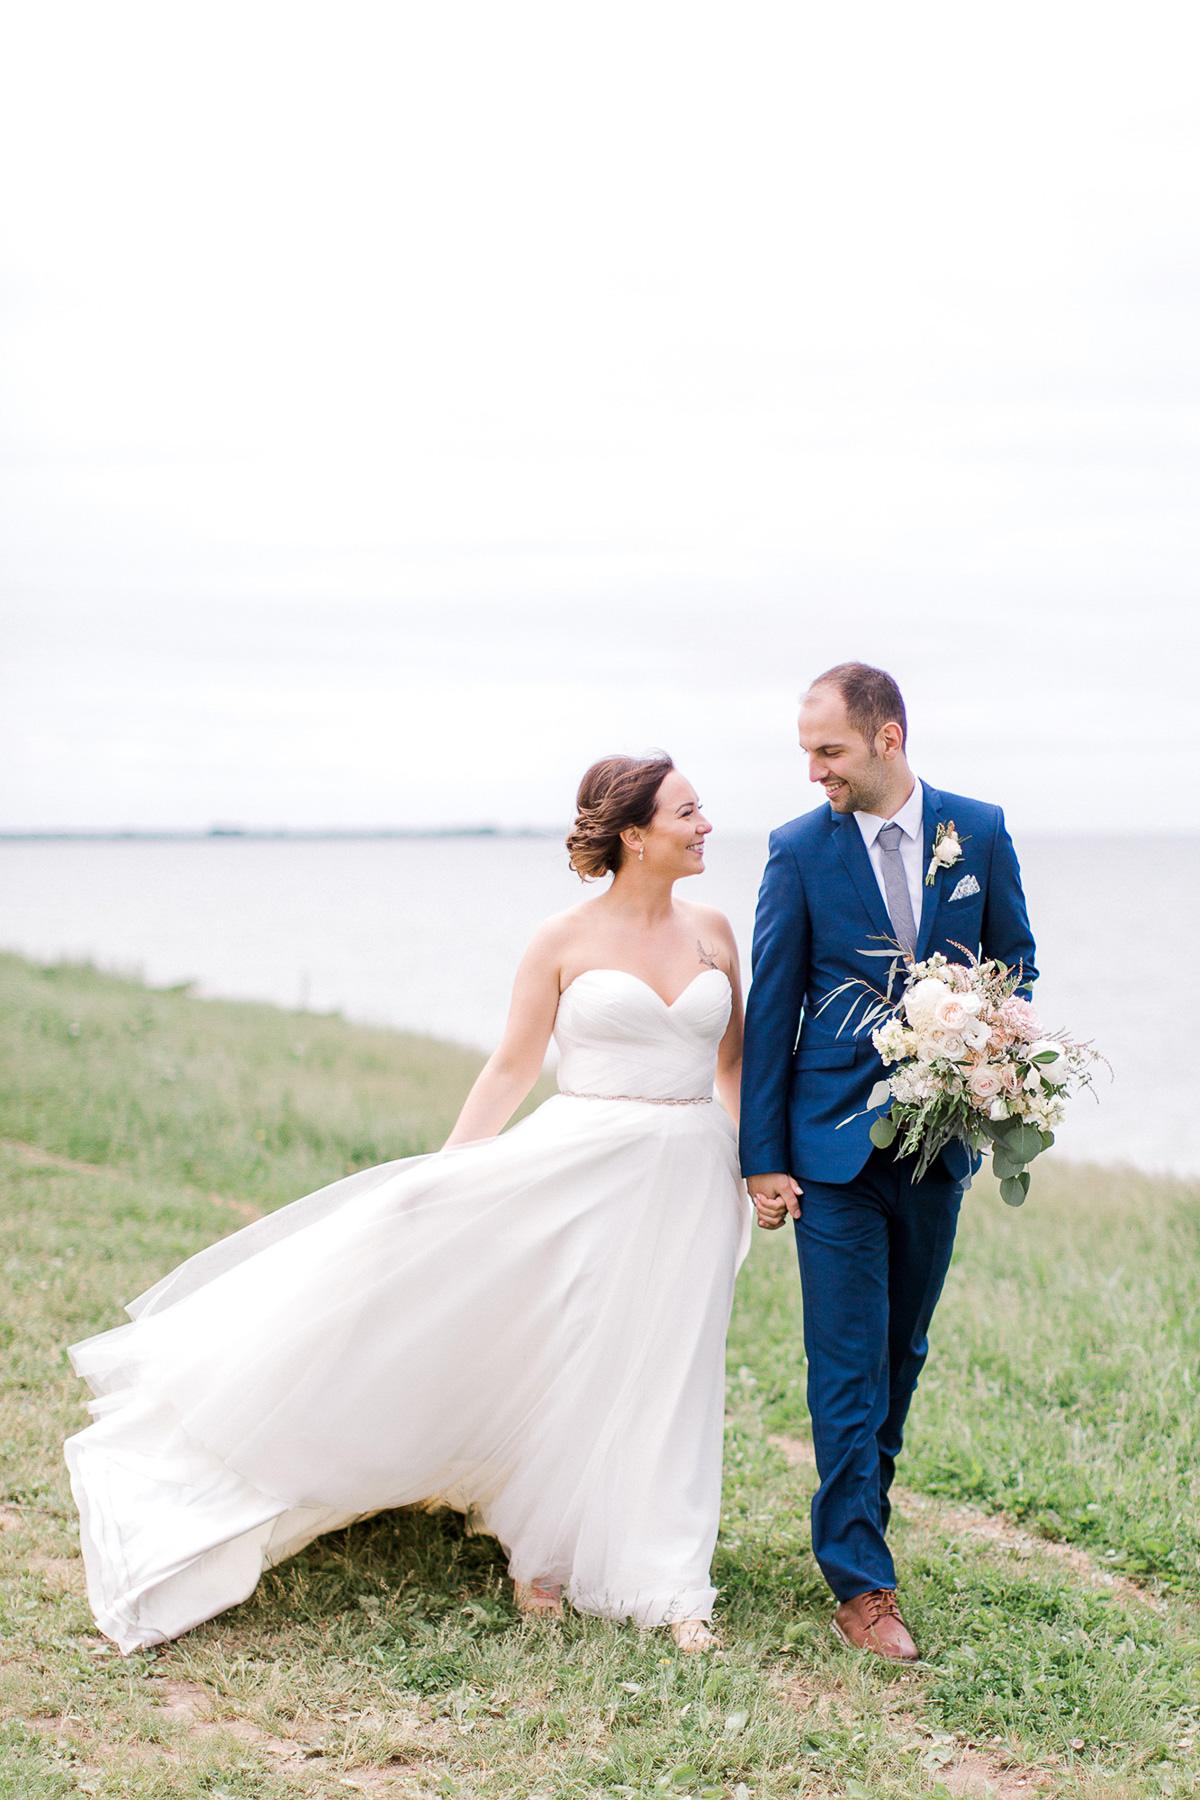 beatrice-elford-photography-vineyard-bride-swish-list-balls-falls-vineland-wedding-22.jpg